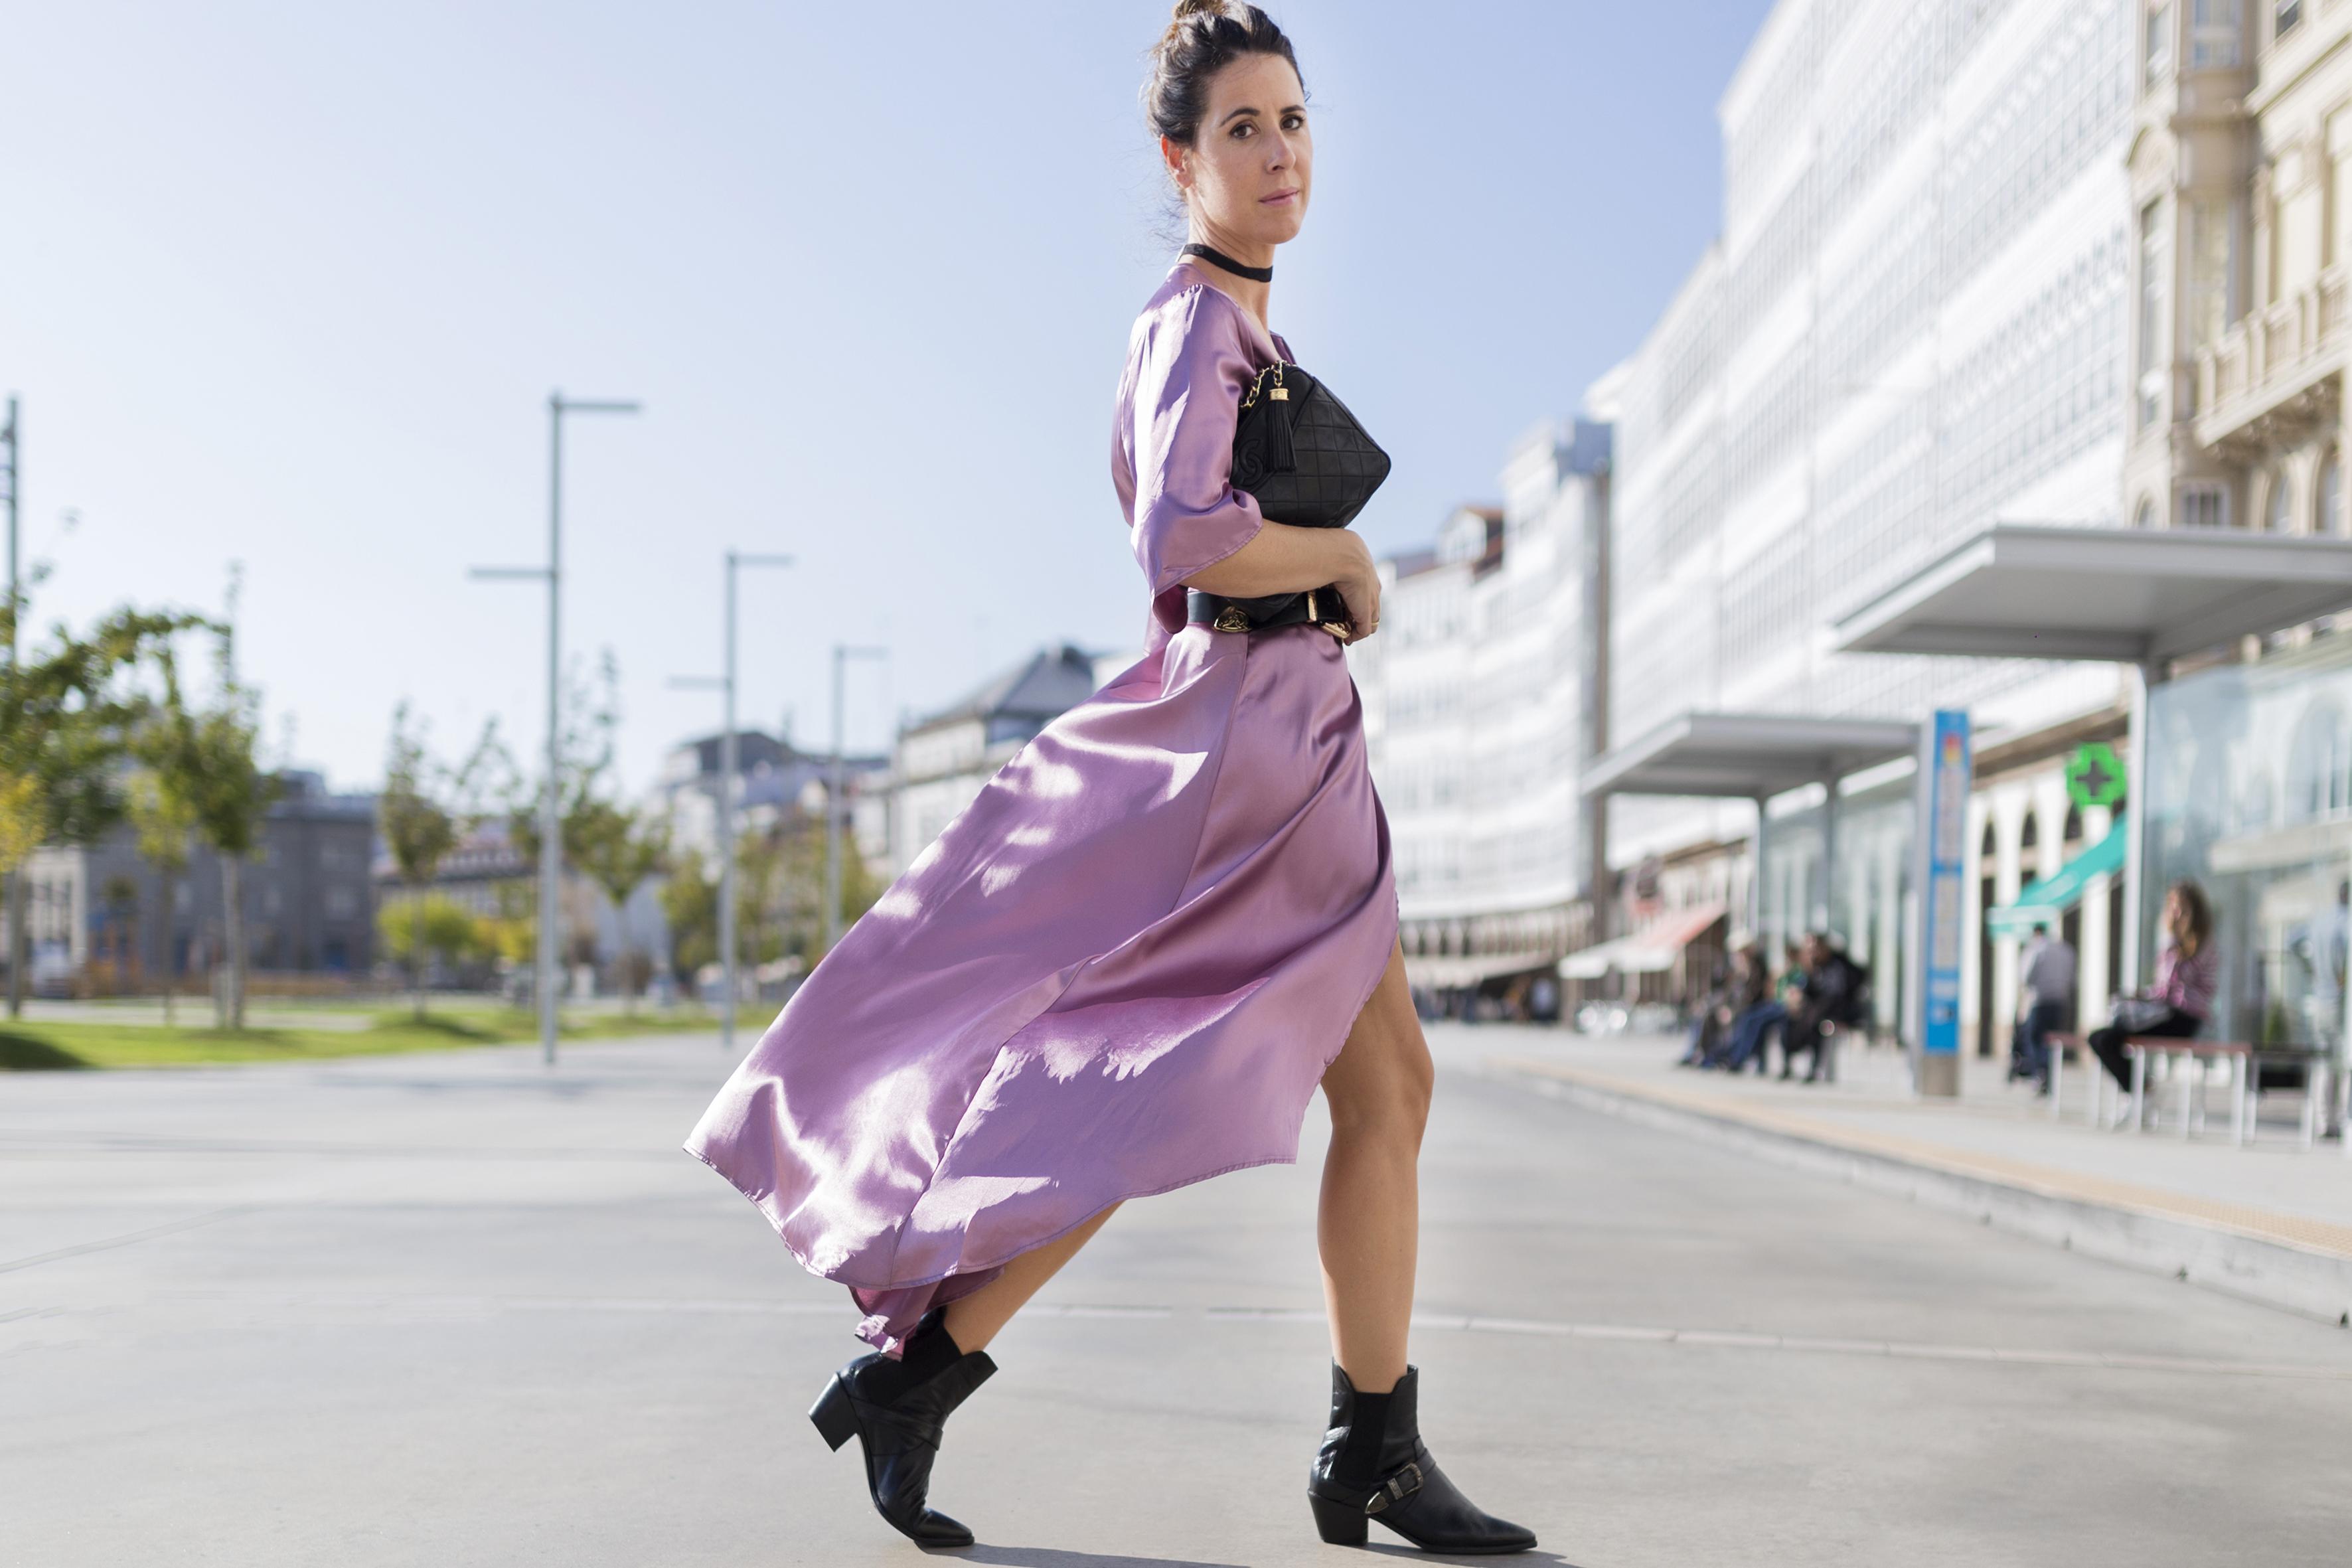 alba cuesta- vintage - botines - zara-chanel vintage-StyleLovely-blogger-vestido satinado - descalzaporelparque-choker zara - SHEIN - ootd - galicia - fashion -blogger - style - moda calle - streetstyle - denia priegue - video - Shein dress - chanel -